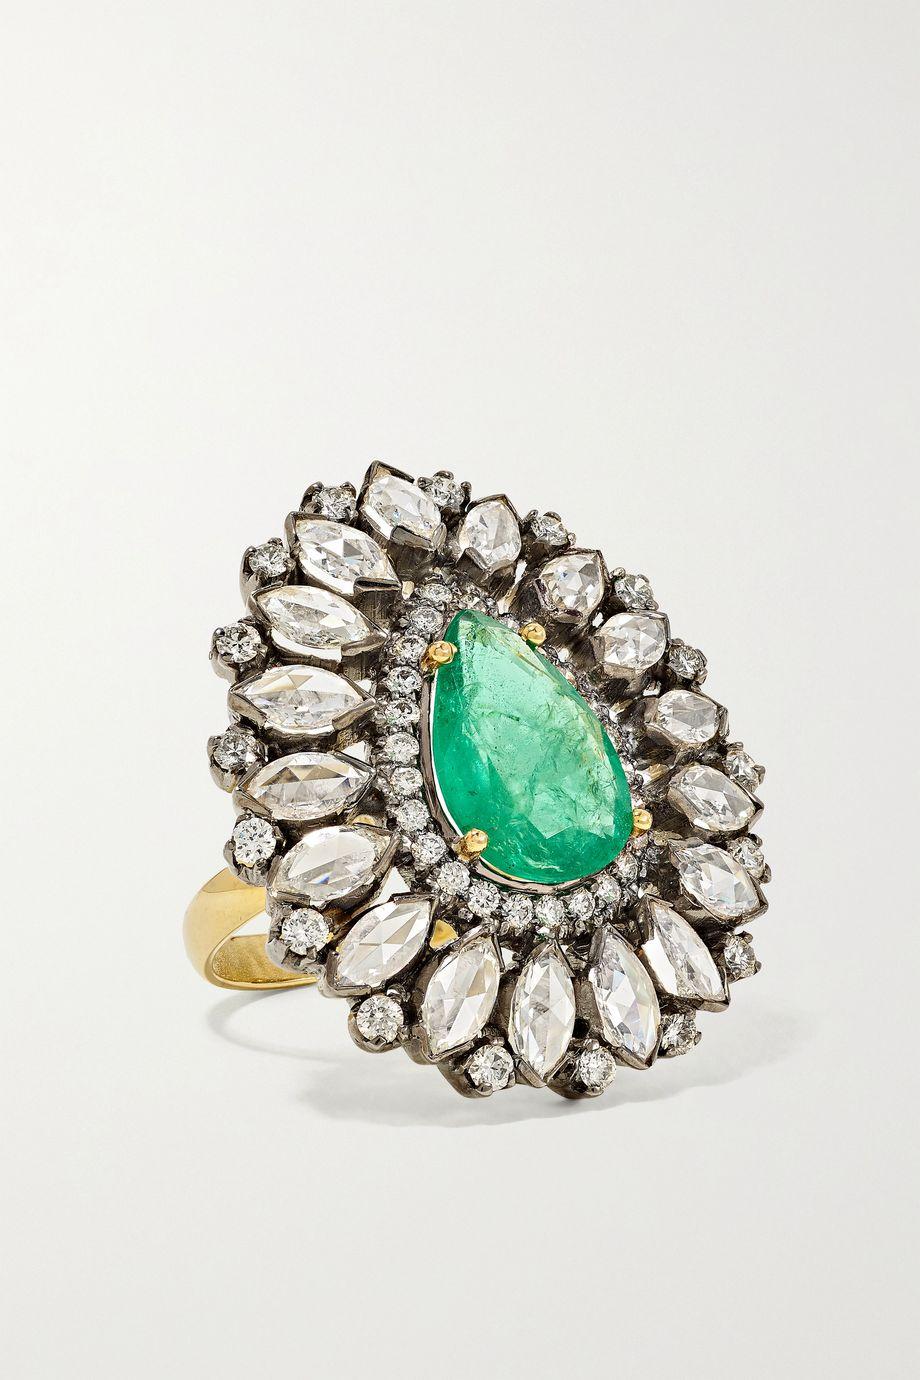 Amrapali 18-karat gold, sterling silver, emerald and diamond ring